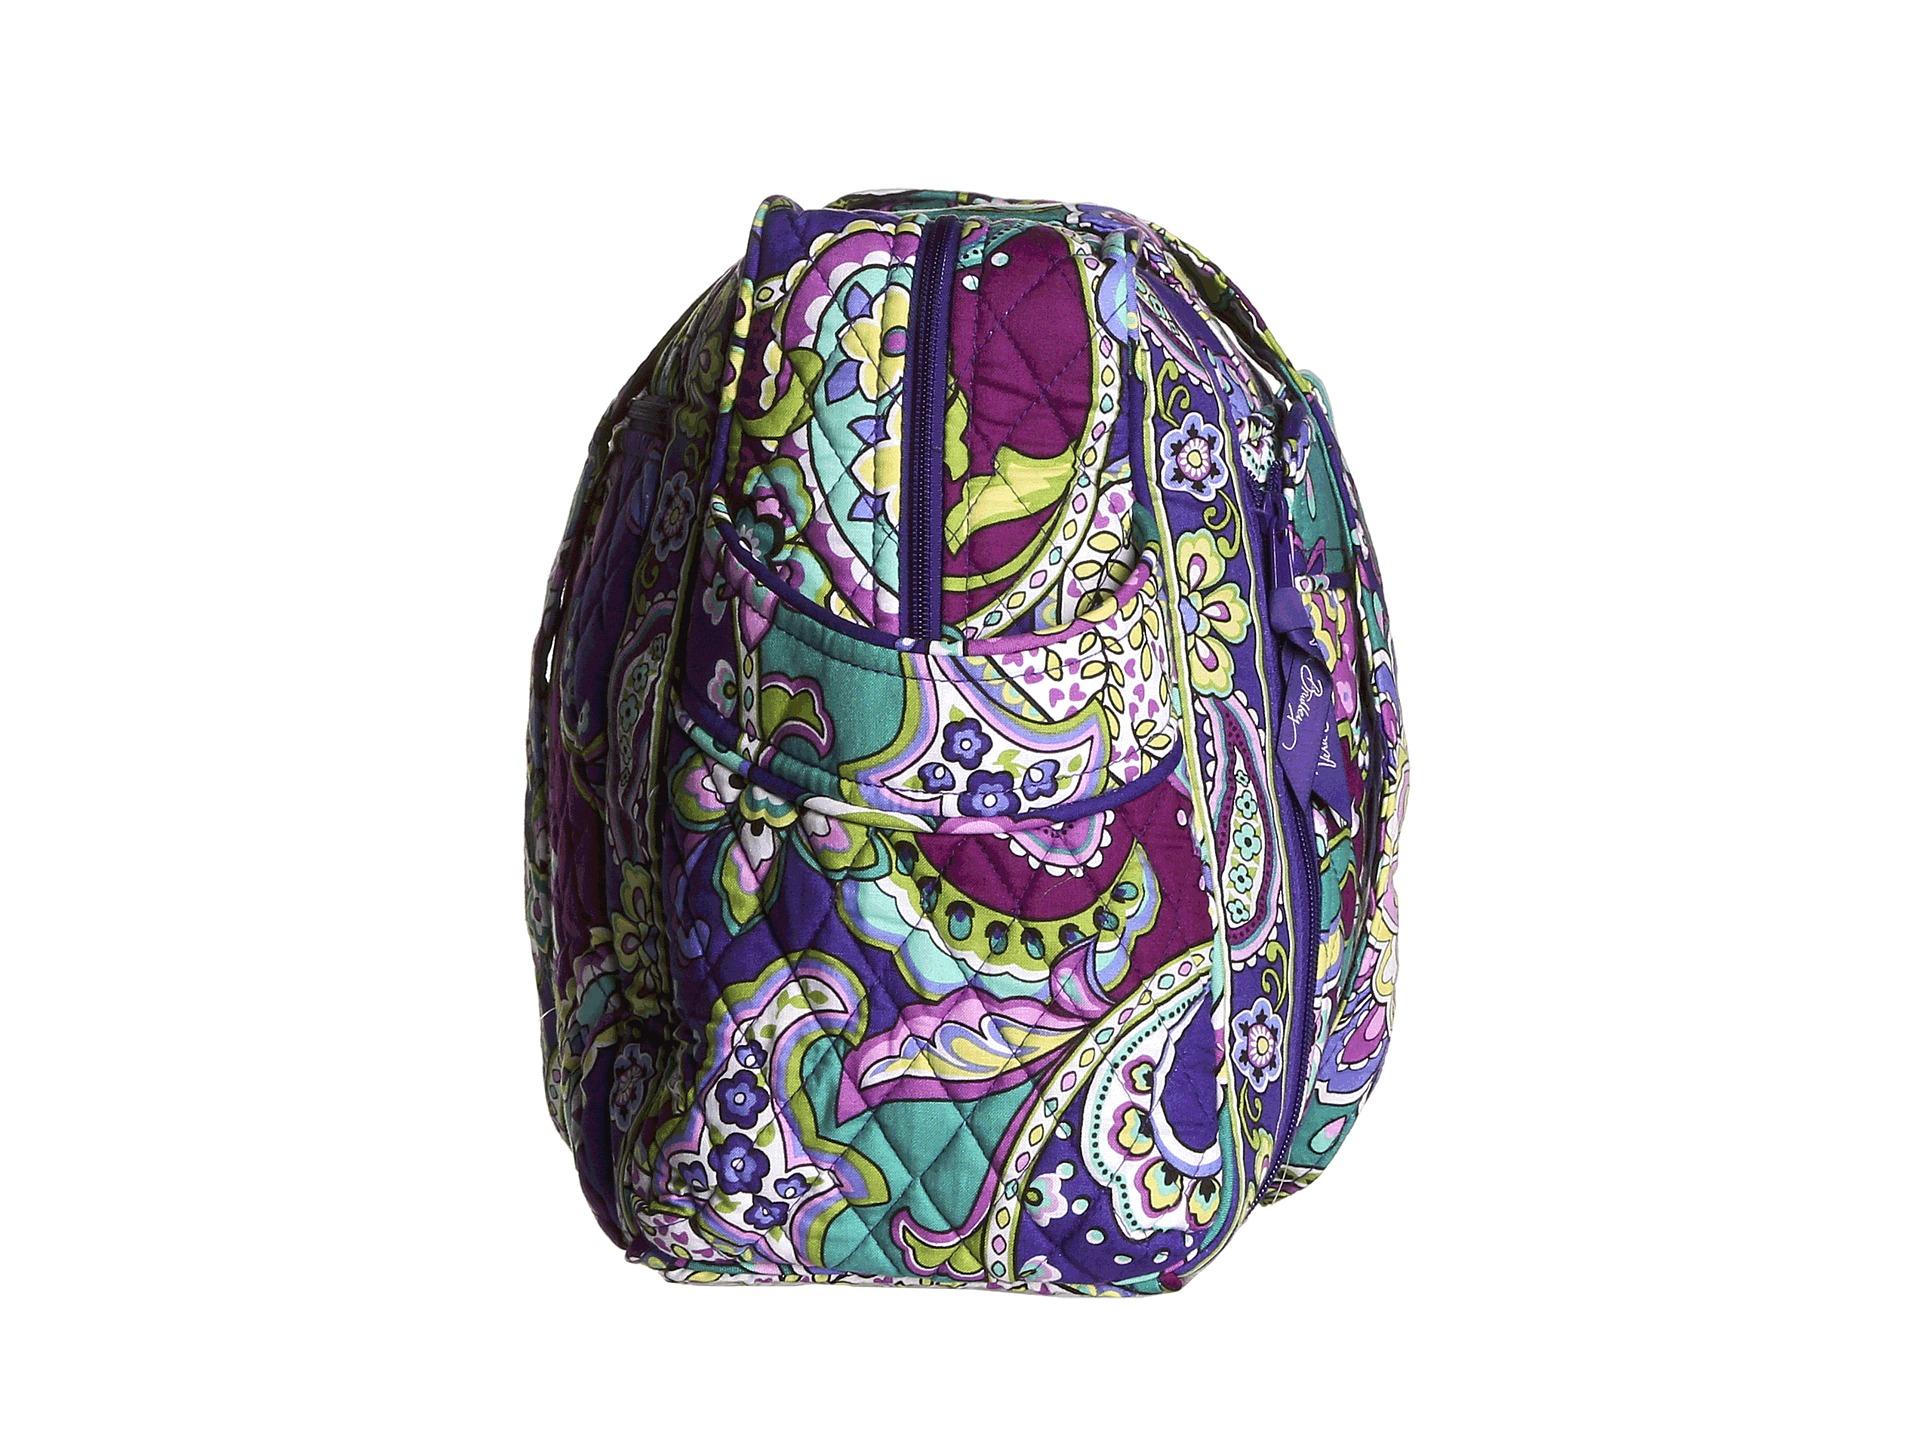 vera bradley make a change baby bag free shipping both ways. Black Bedroom Furniture Sets. Home Design Ideas